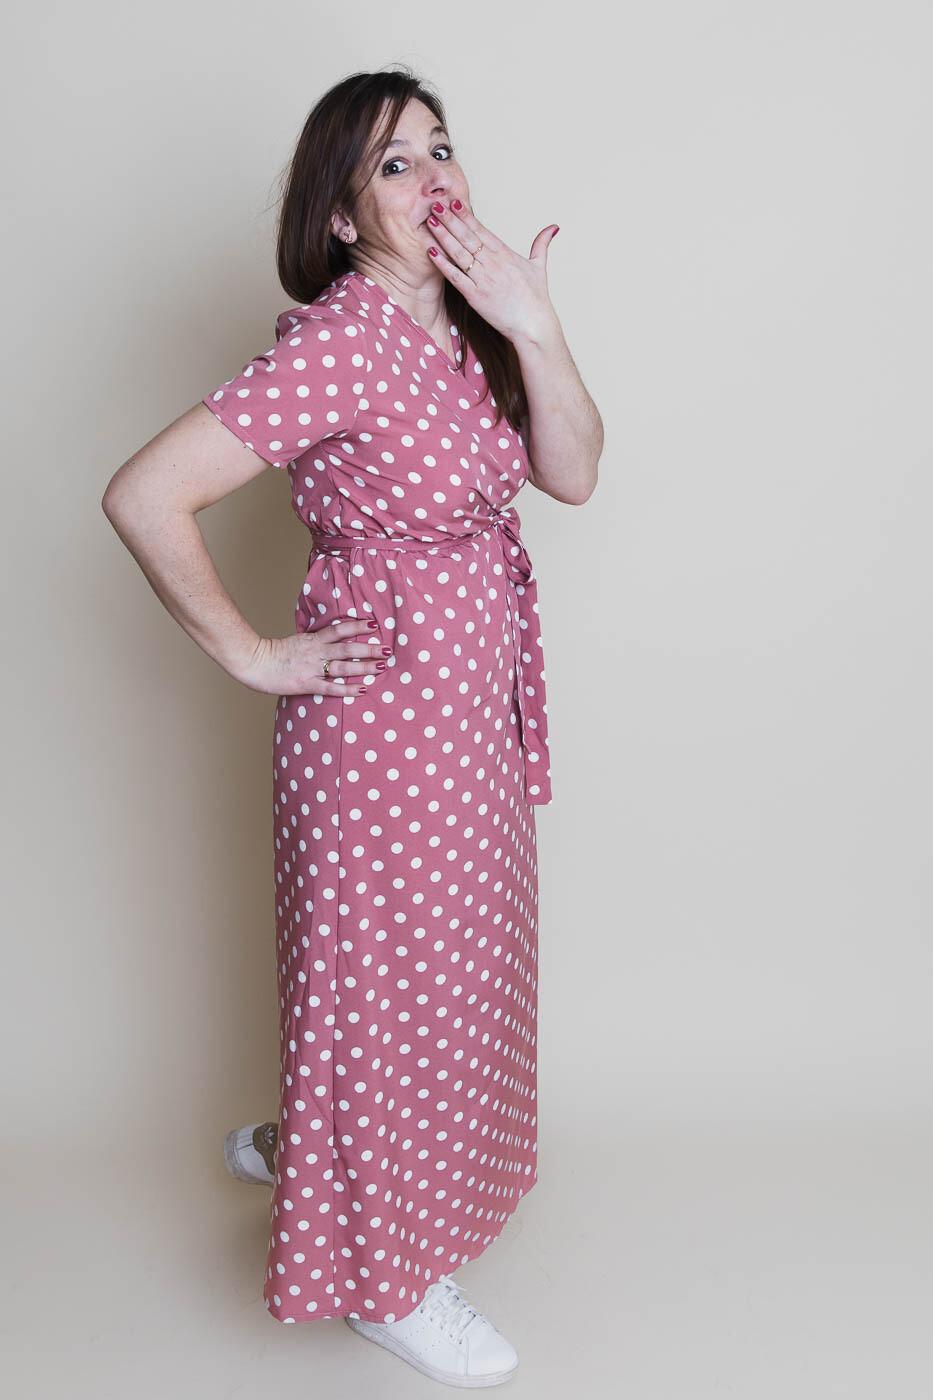 Maxi jurk - ESTER - roze met witte bolletjes